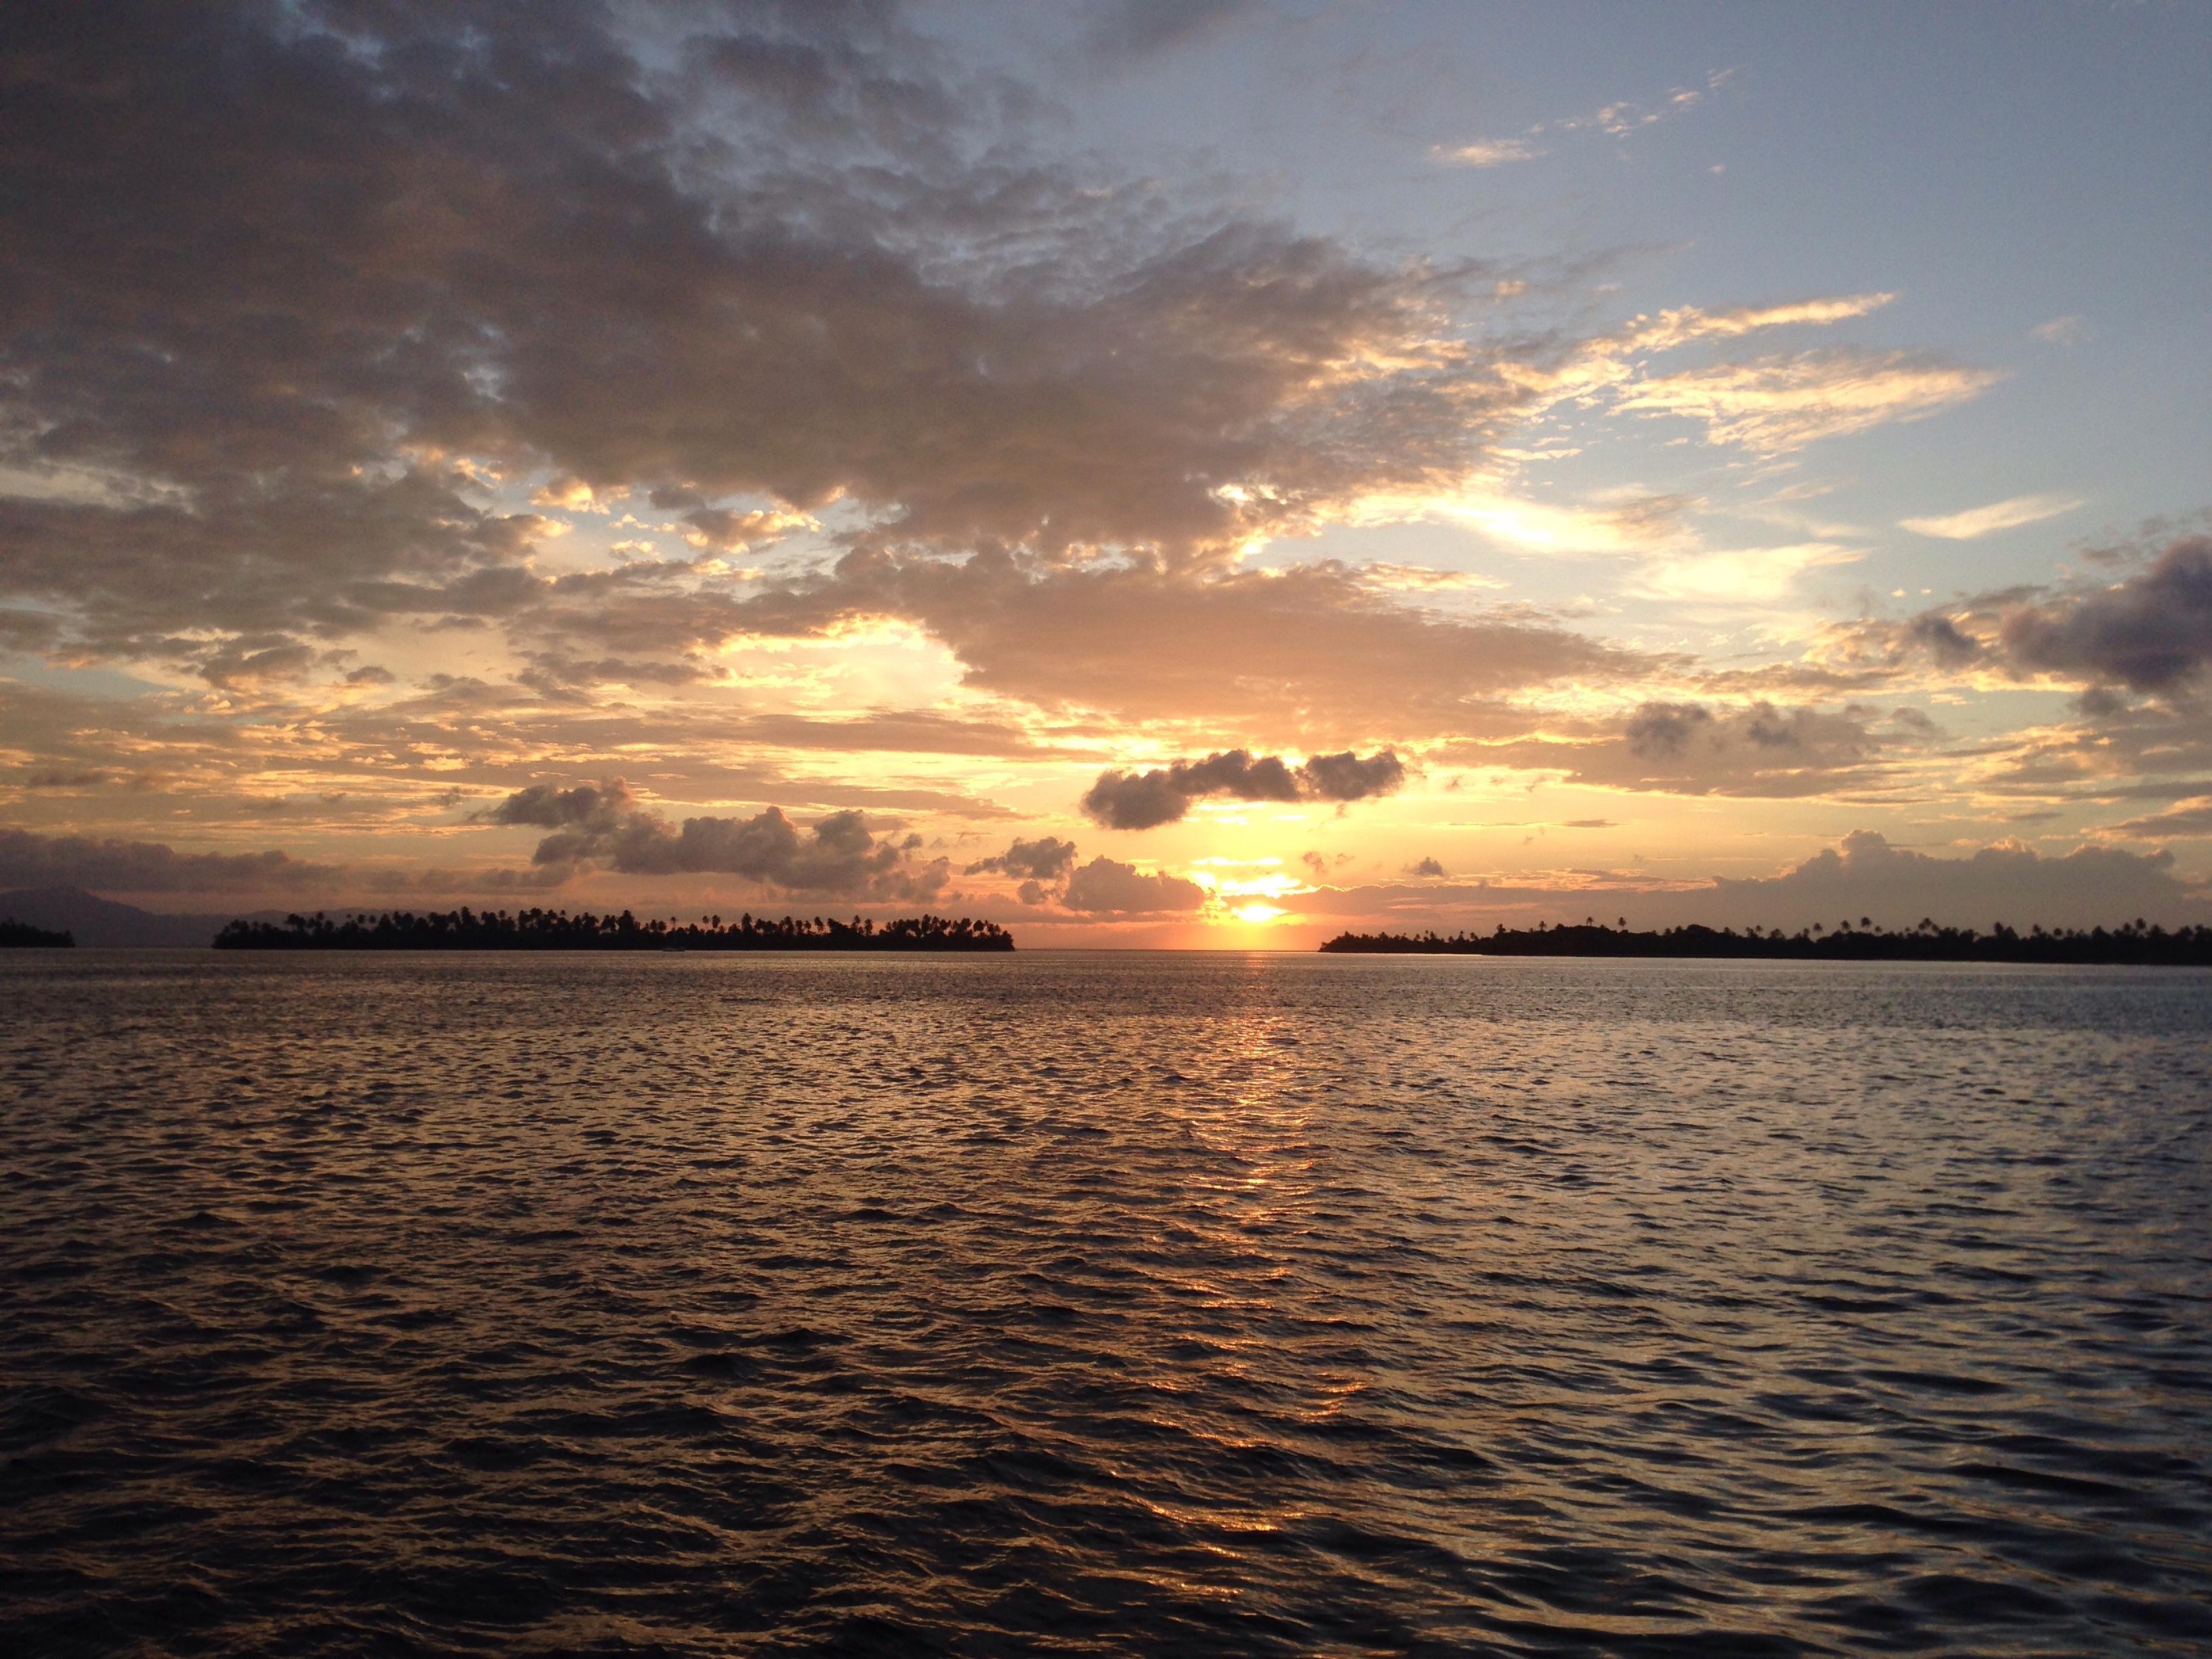 Sunrise in the San Blas Islands.